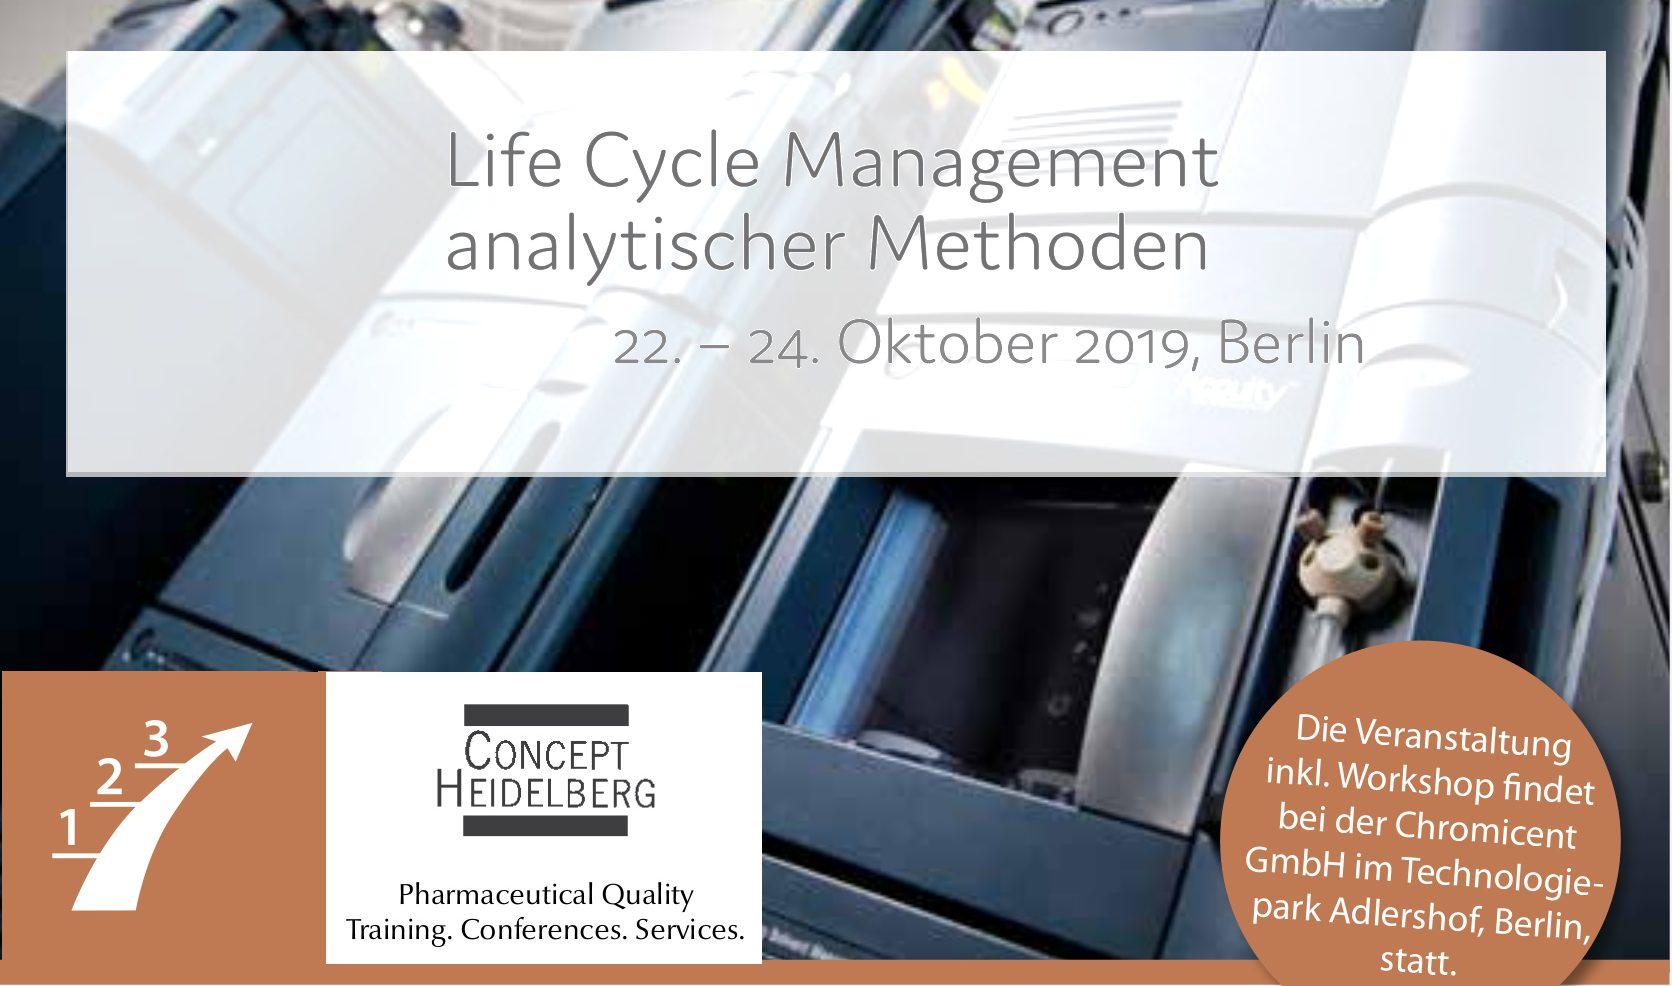 Life Cycle Management analytischer Methoden 2019